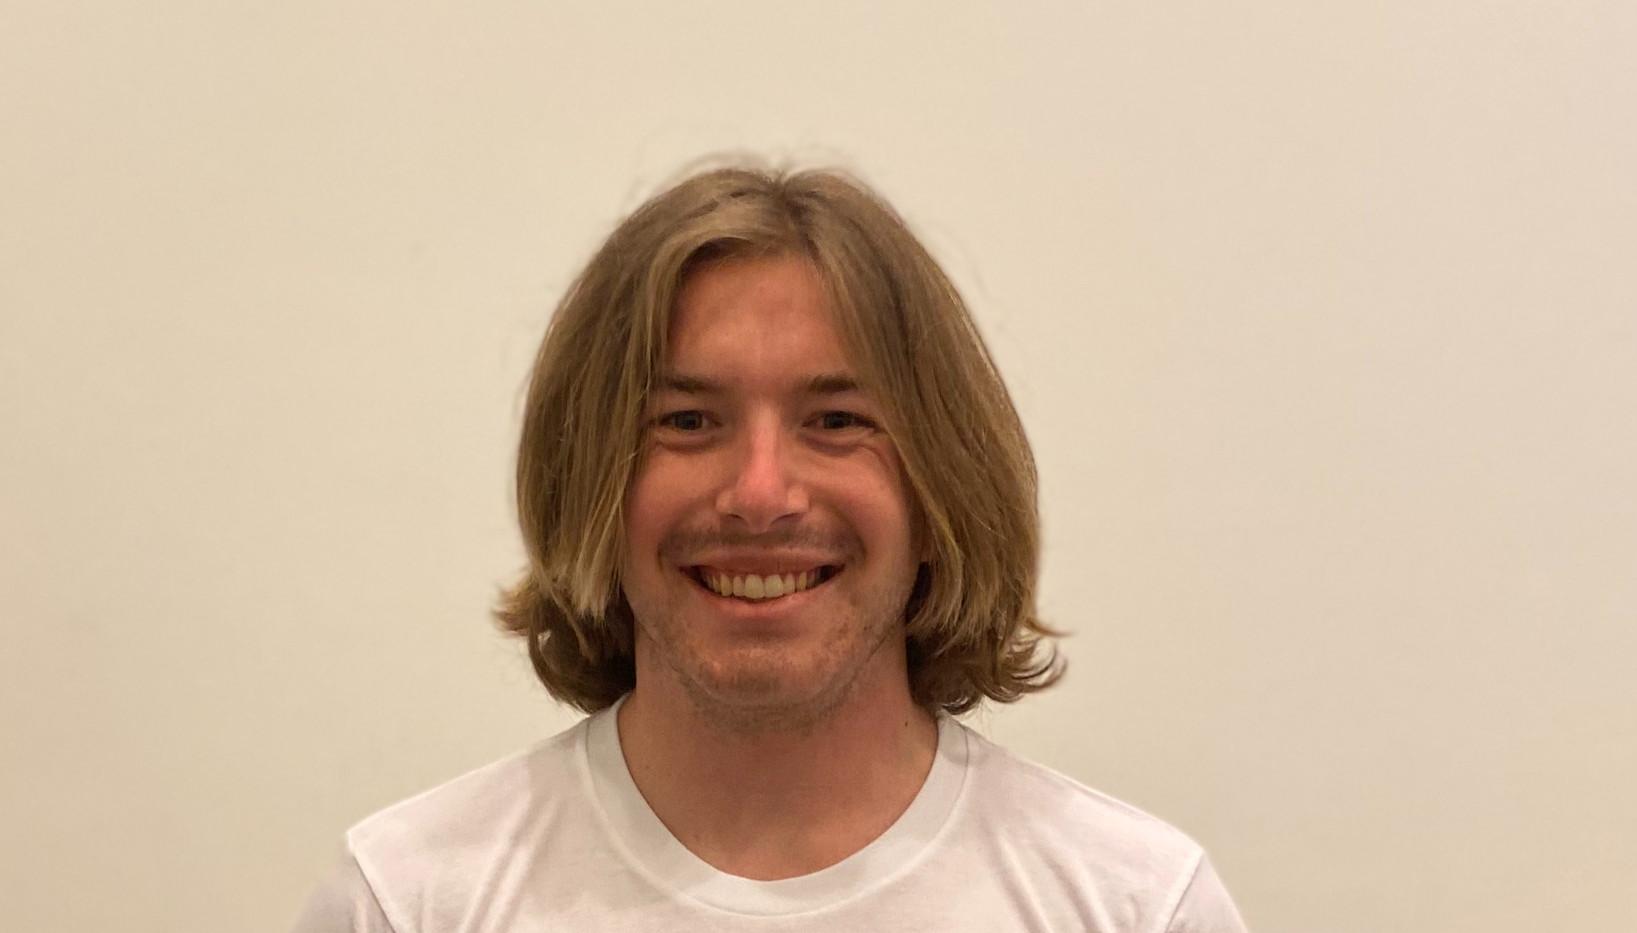 Alexander Ray (Inventory Controller)